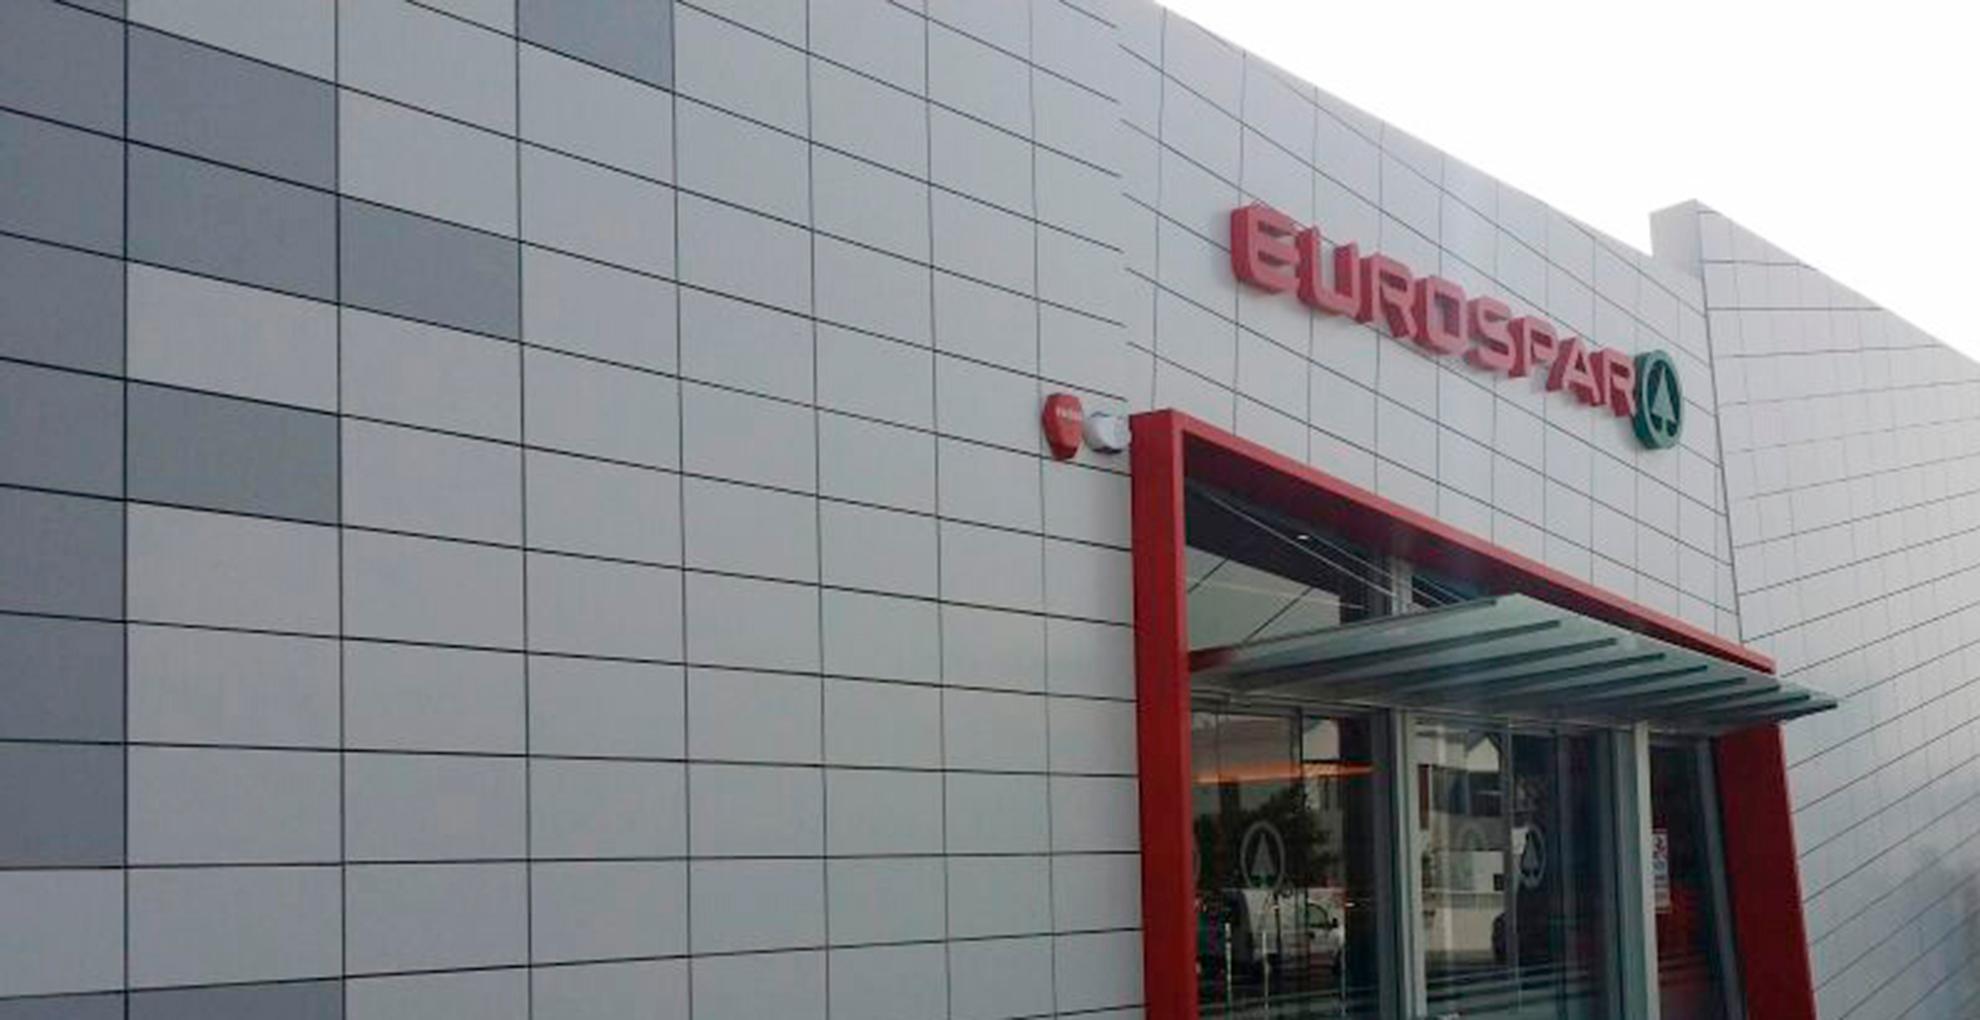 Supermercado-SPAR.-Lanzarote-Espaa.-larson-FR-2_1585908320.jpg